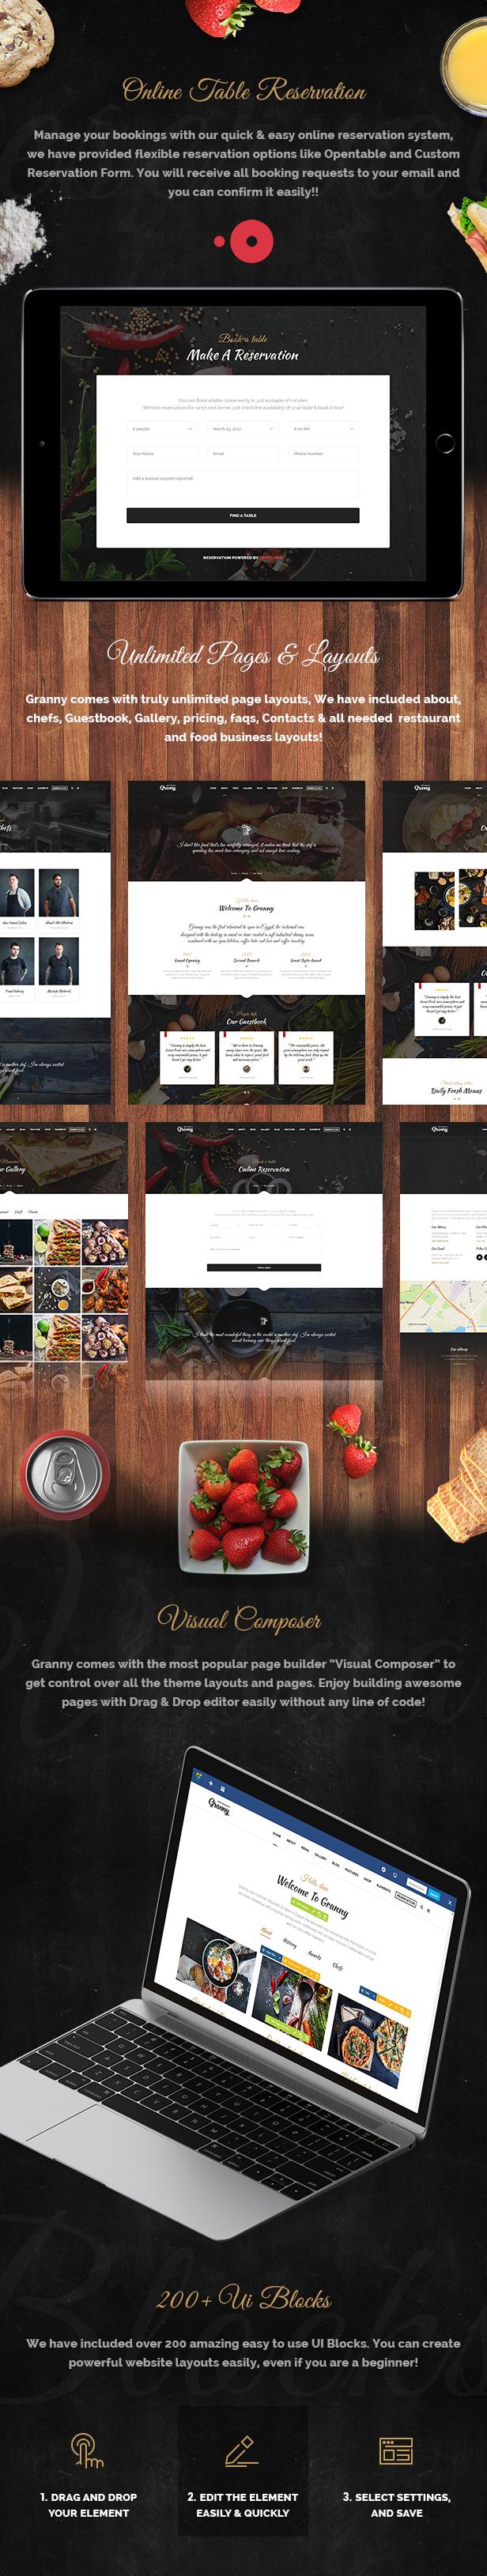 Restaurant Granny - Elegant Restaurant & Cafe WordPress Theme - 8